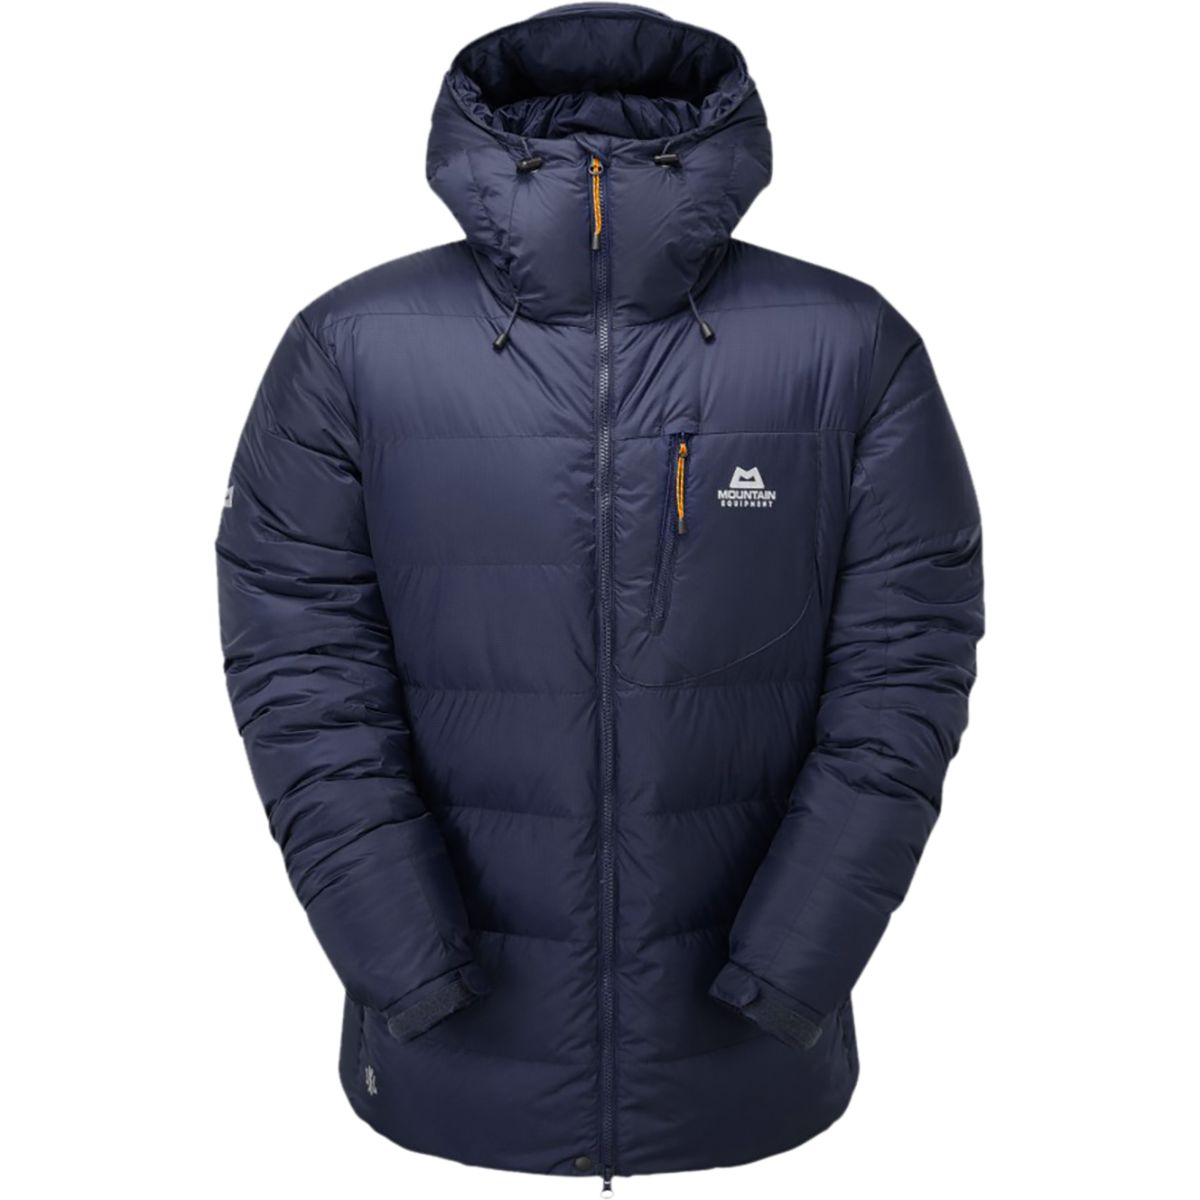 Mountain Equipment K7 Jacket